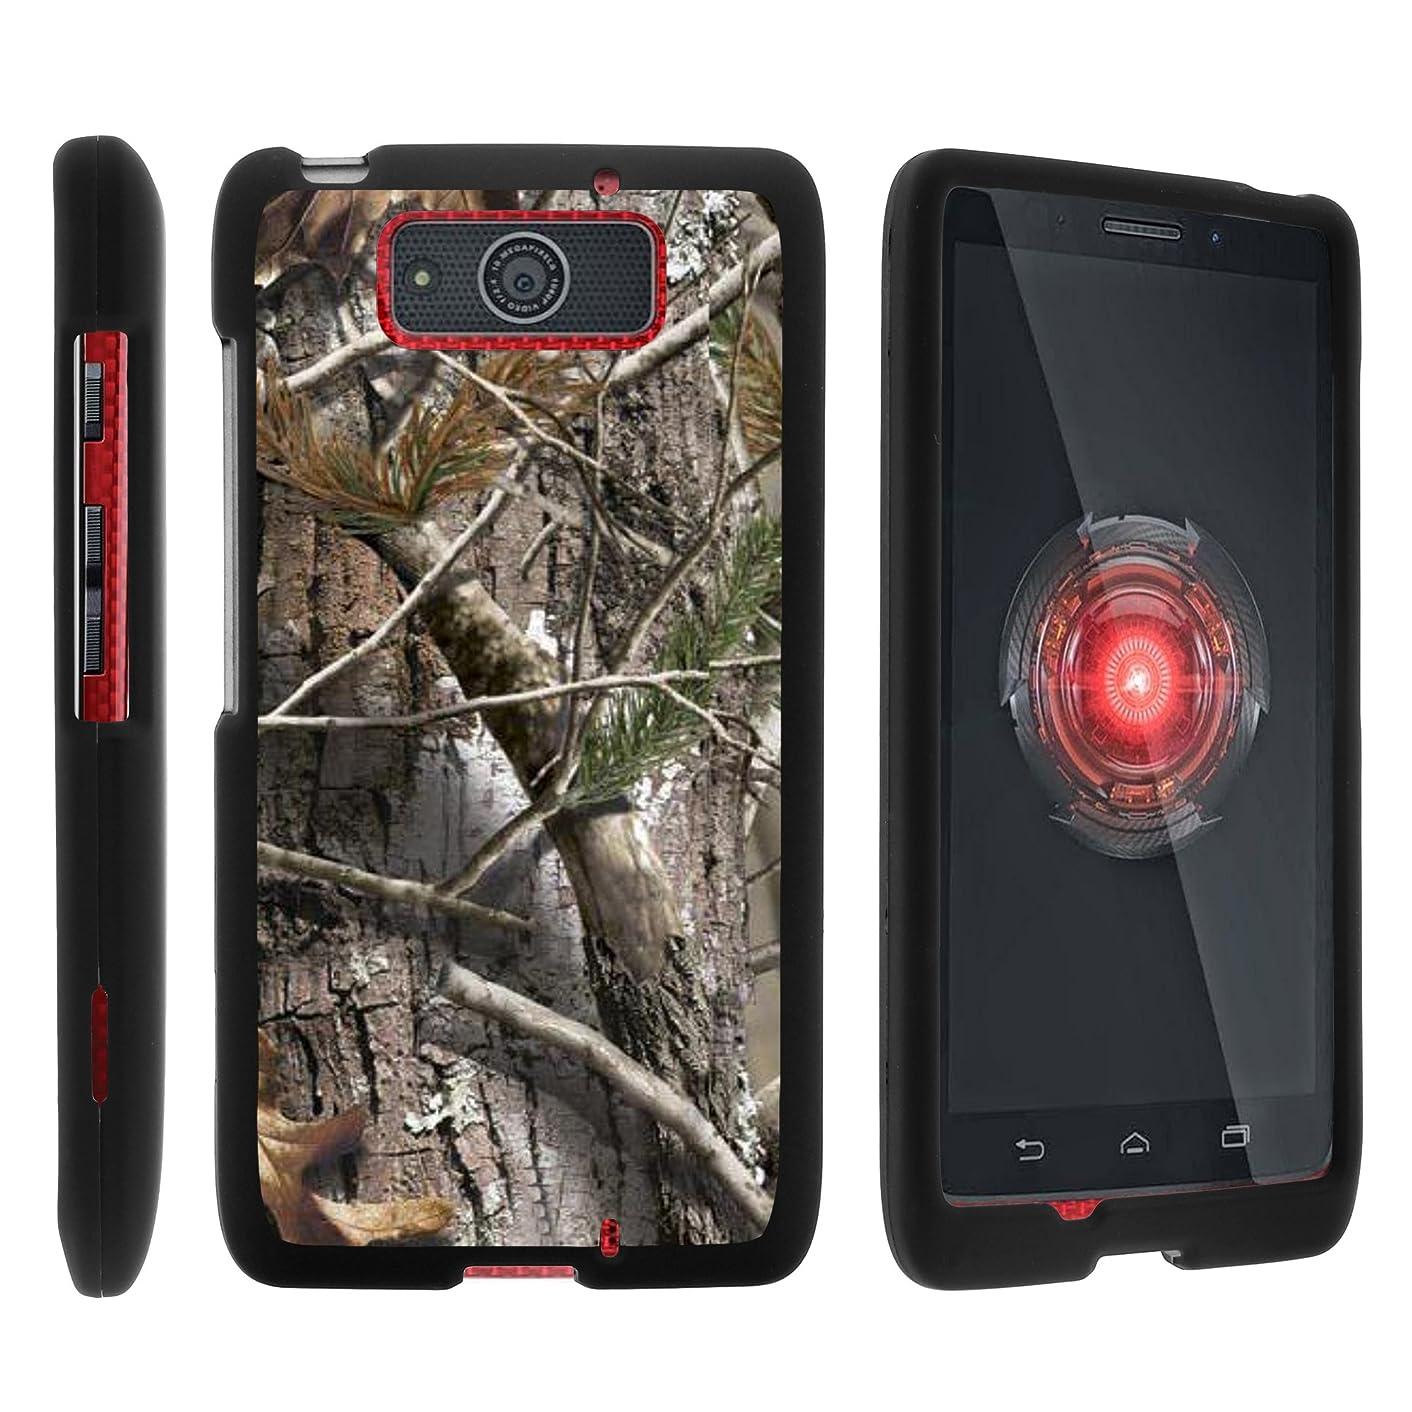 MINITURTLE Case Compatible w/Motorola DRIOD Ultra XT1080M Case, Cell Phone Case Hard Cover w/Cute Design Patterns for Motorola Droid MAXX XT1080 Tree Bark Hunter Camouflage